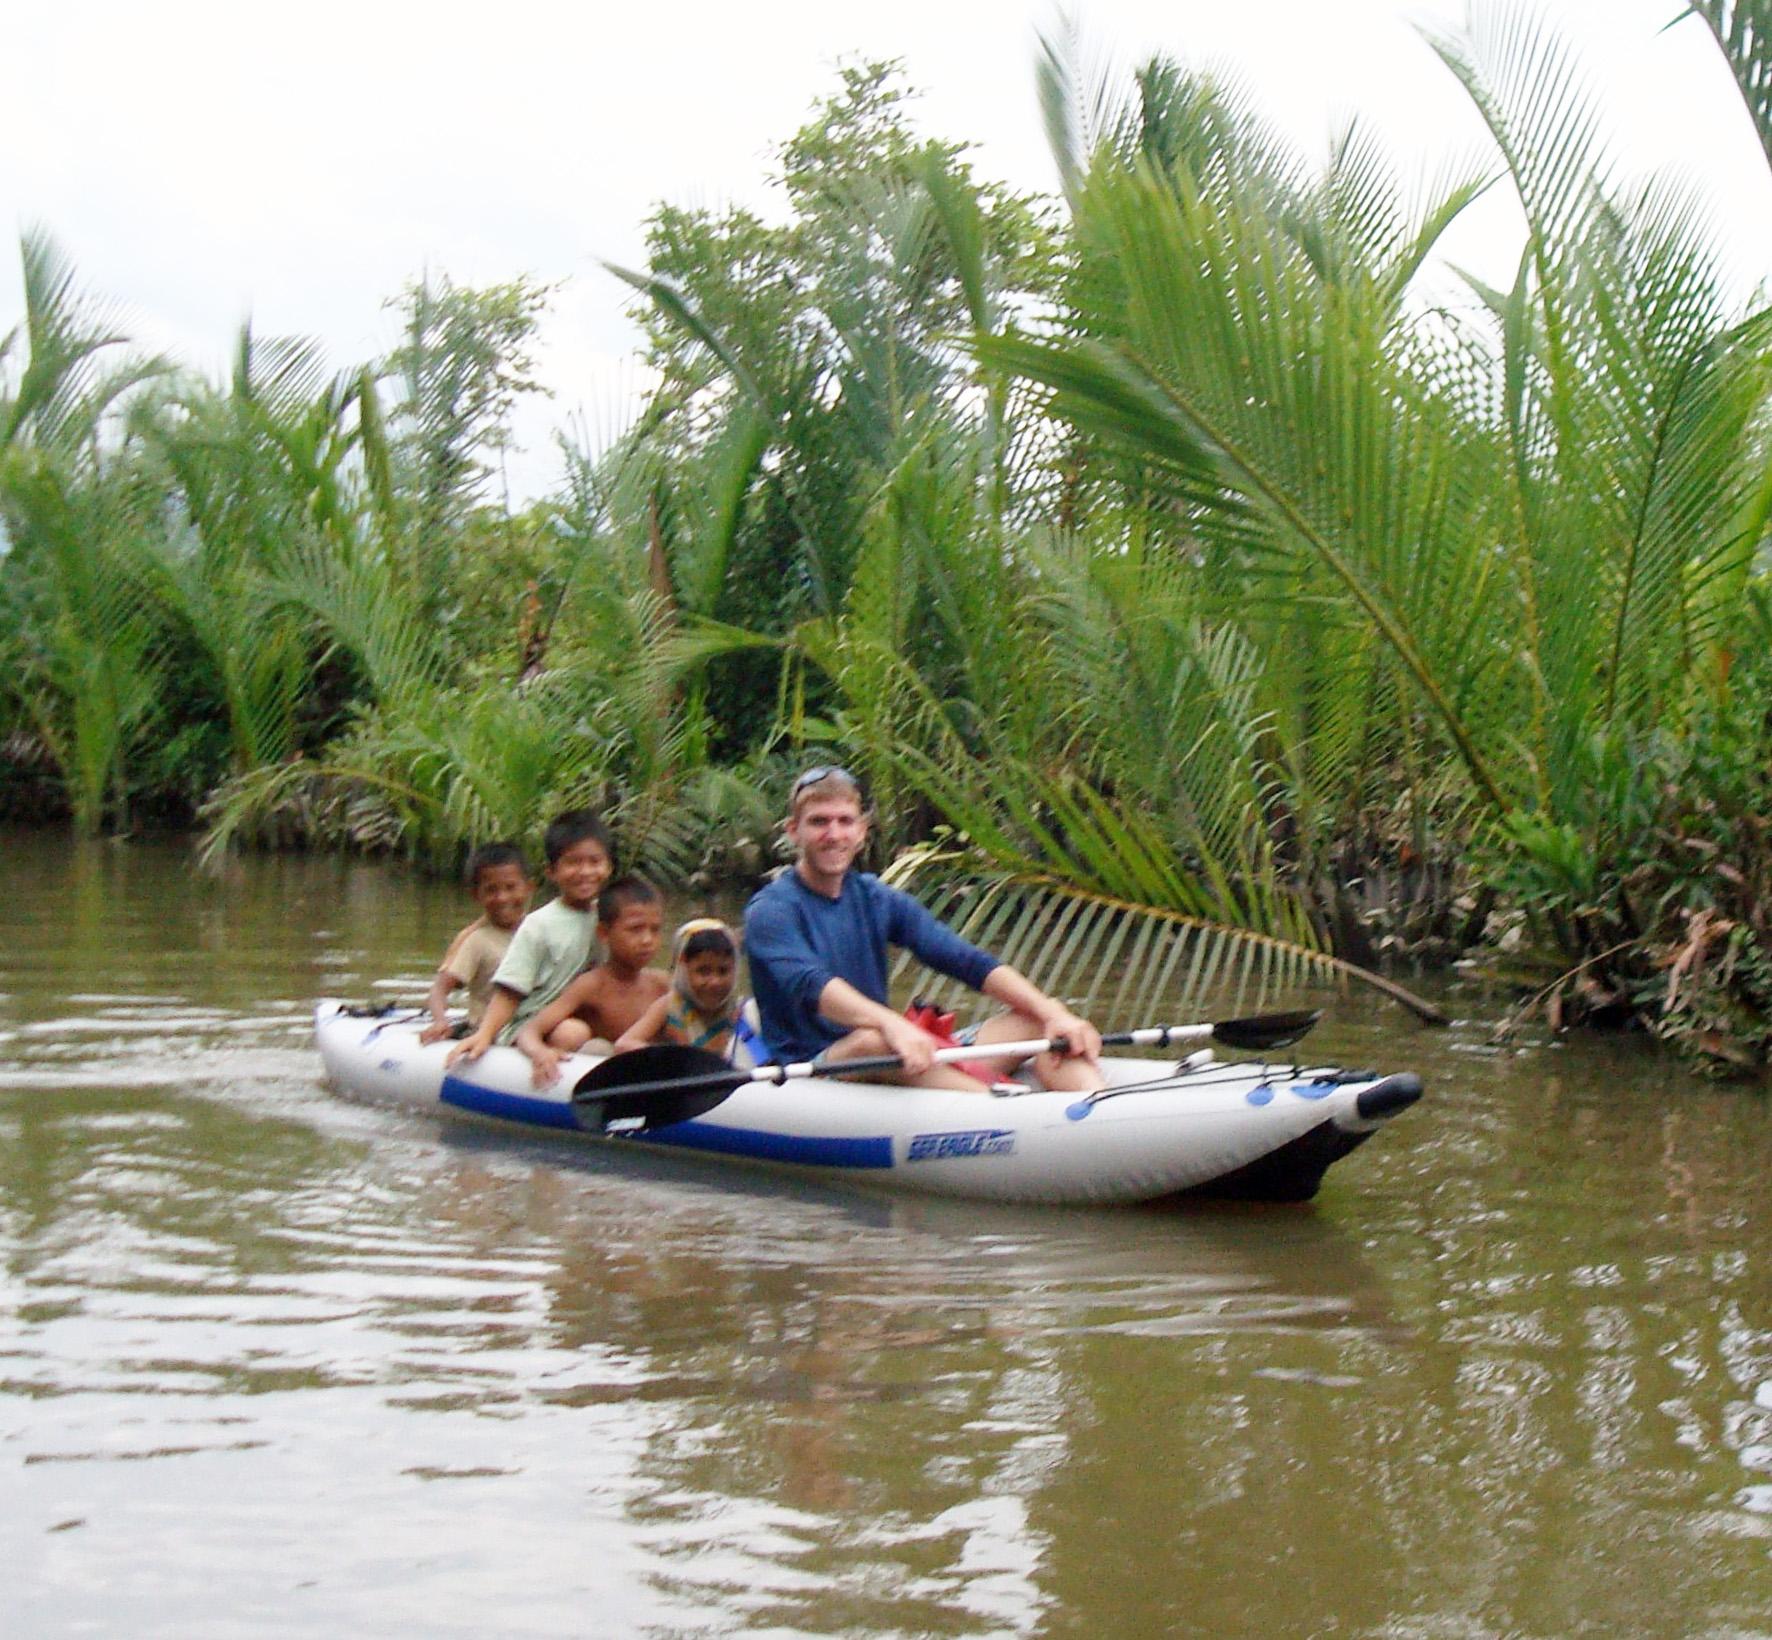 Kayak Accident Delaware River Kayaking In Kampot